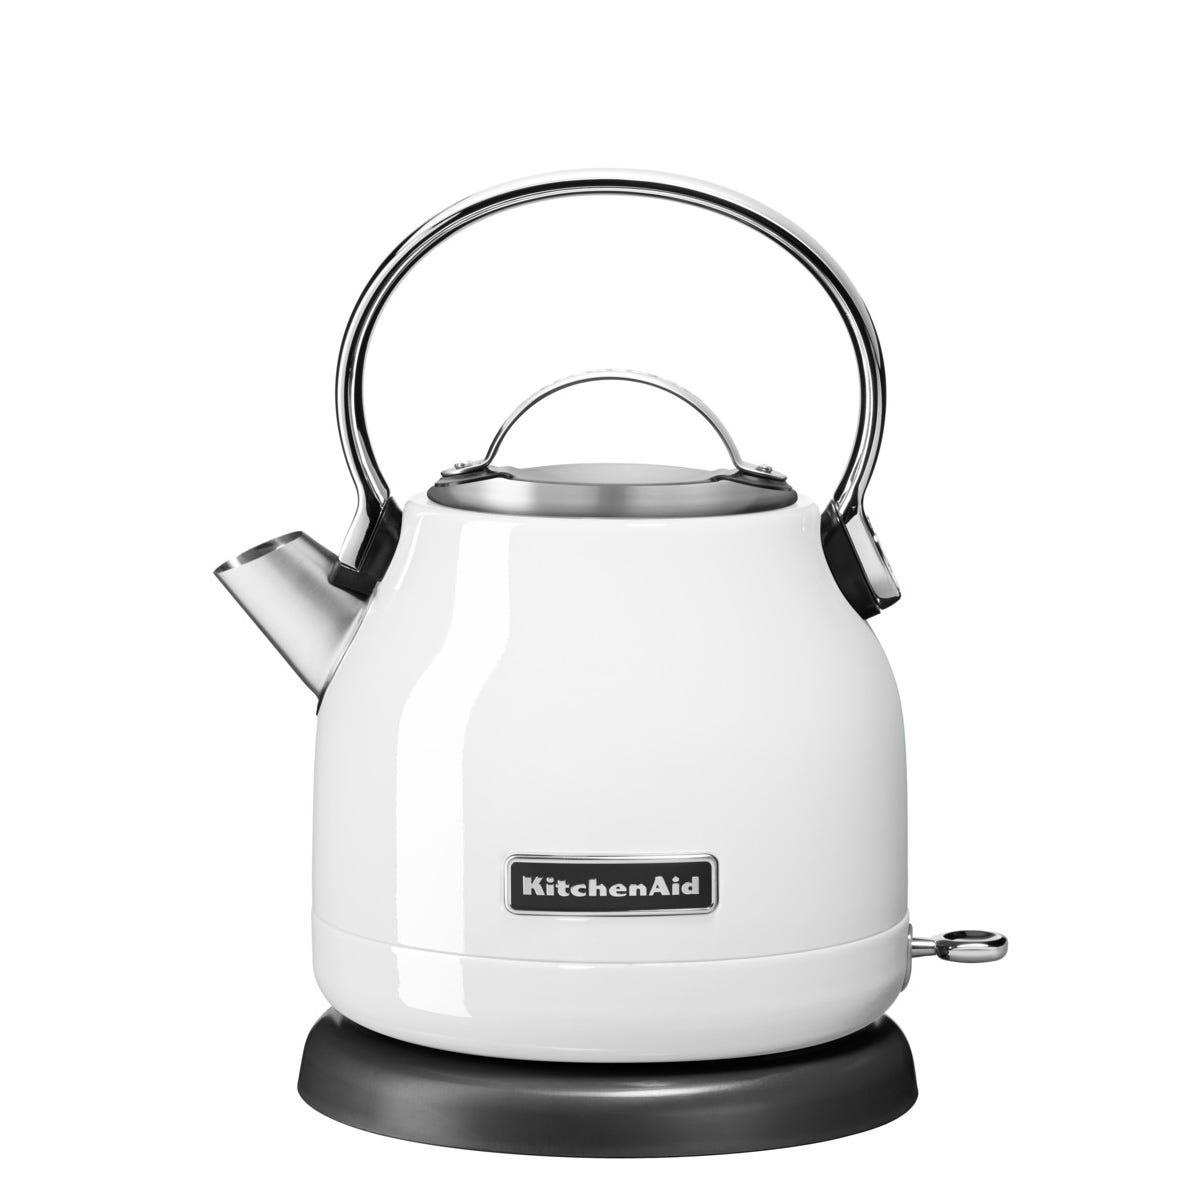 KitchenAid 5KEK1222BWH 1.25L Dome Kettle - White